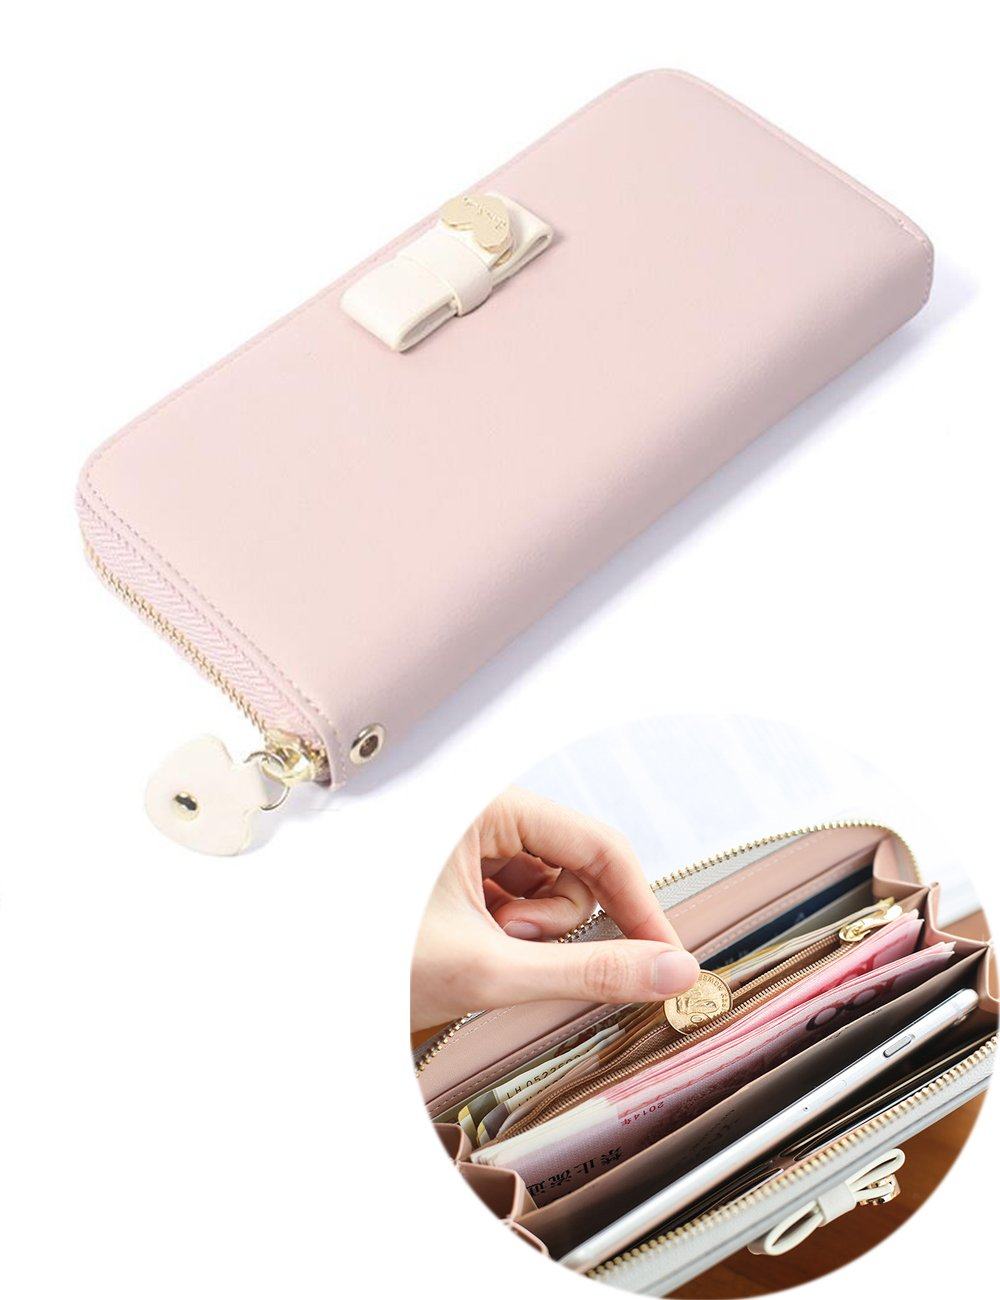 Ifunle Womens Teen Girls Bowknot Zip Around Long Clutch Phone Holder with Wrist Strap (Purple)